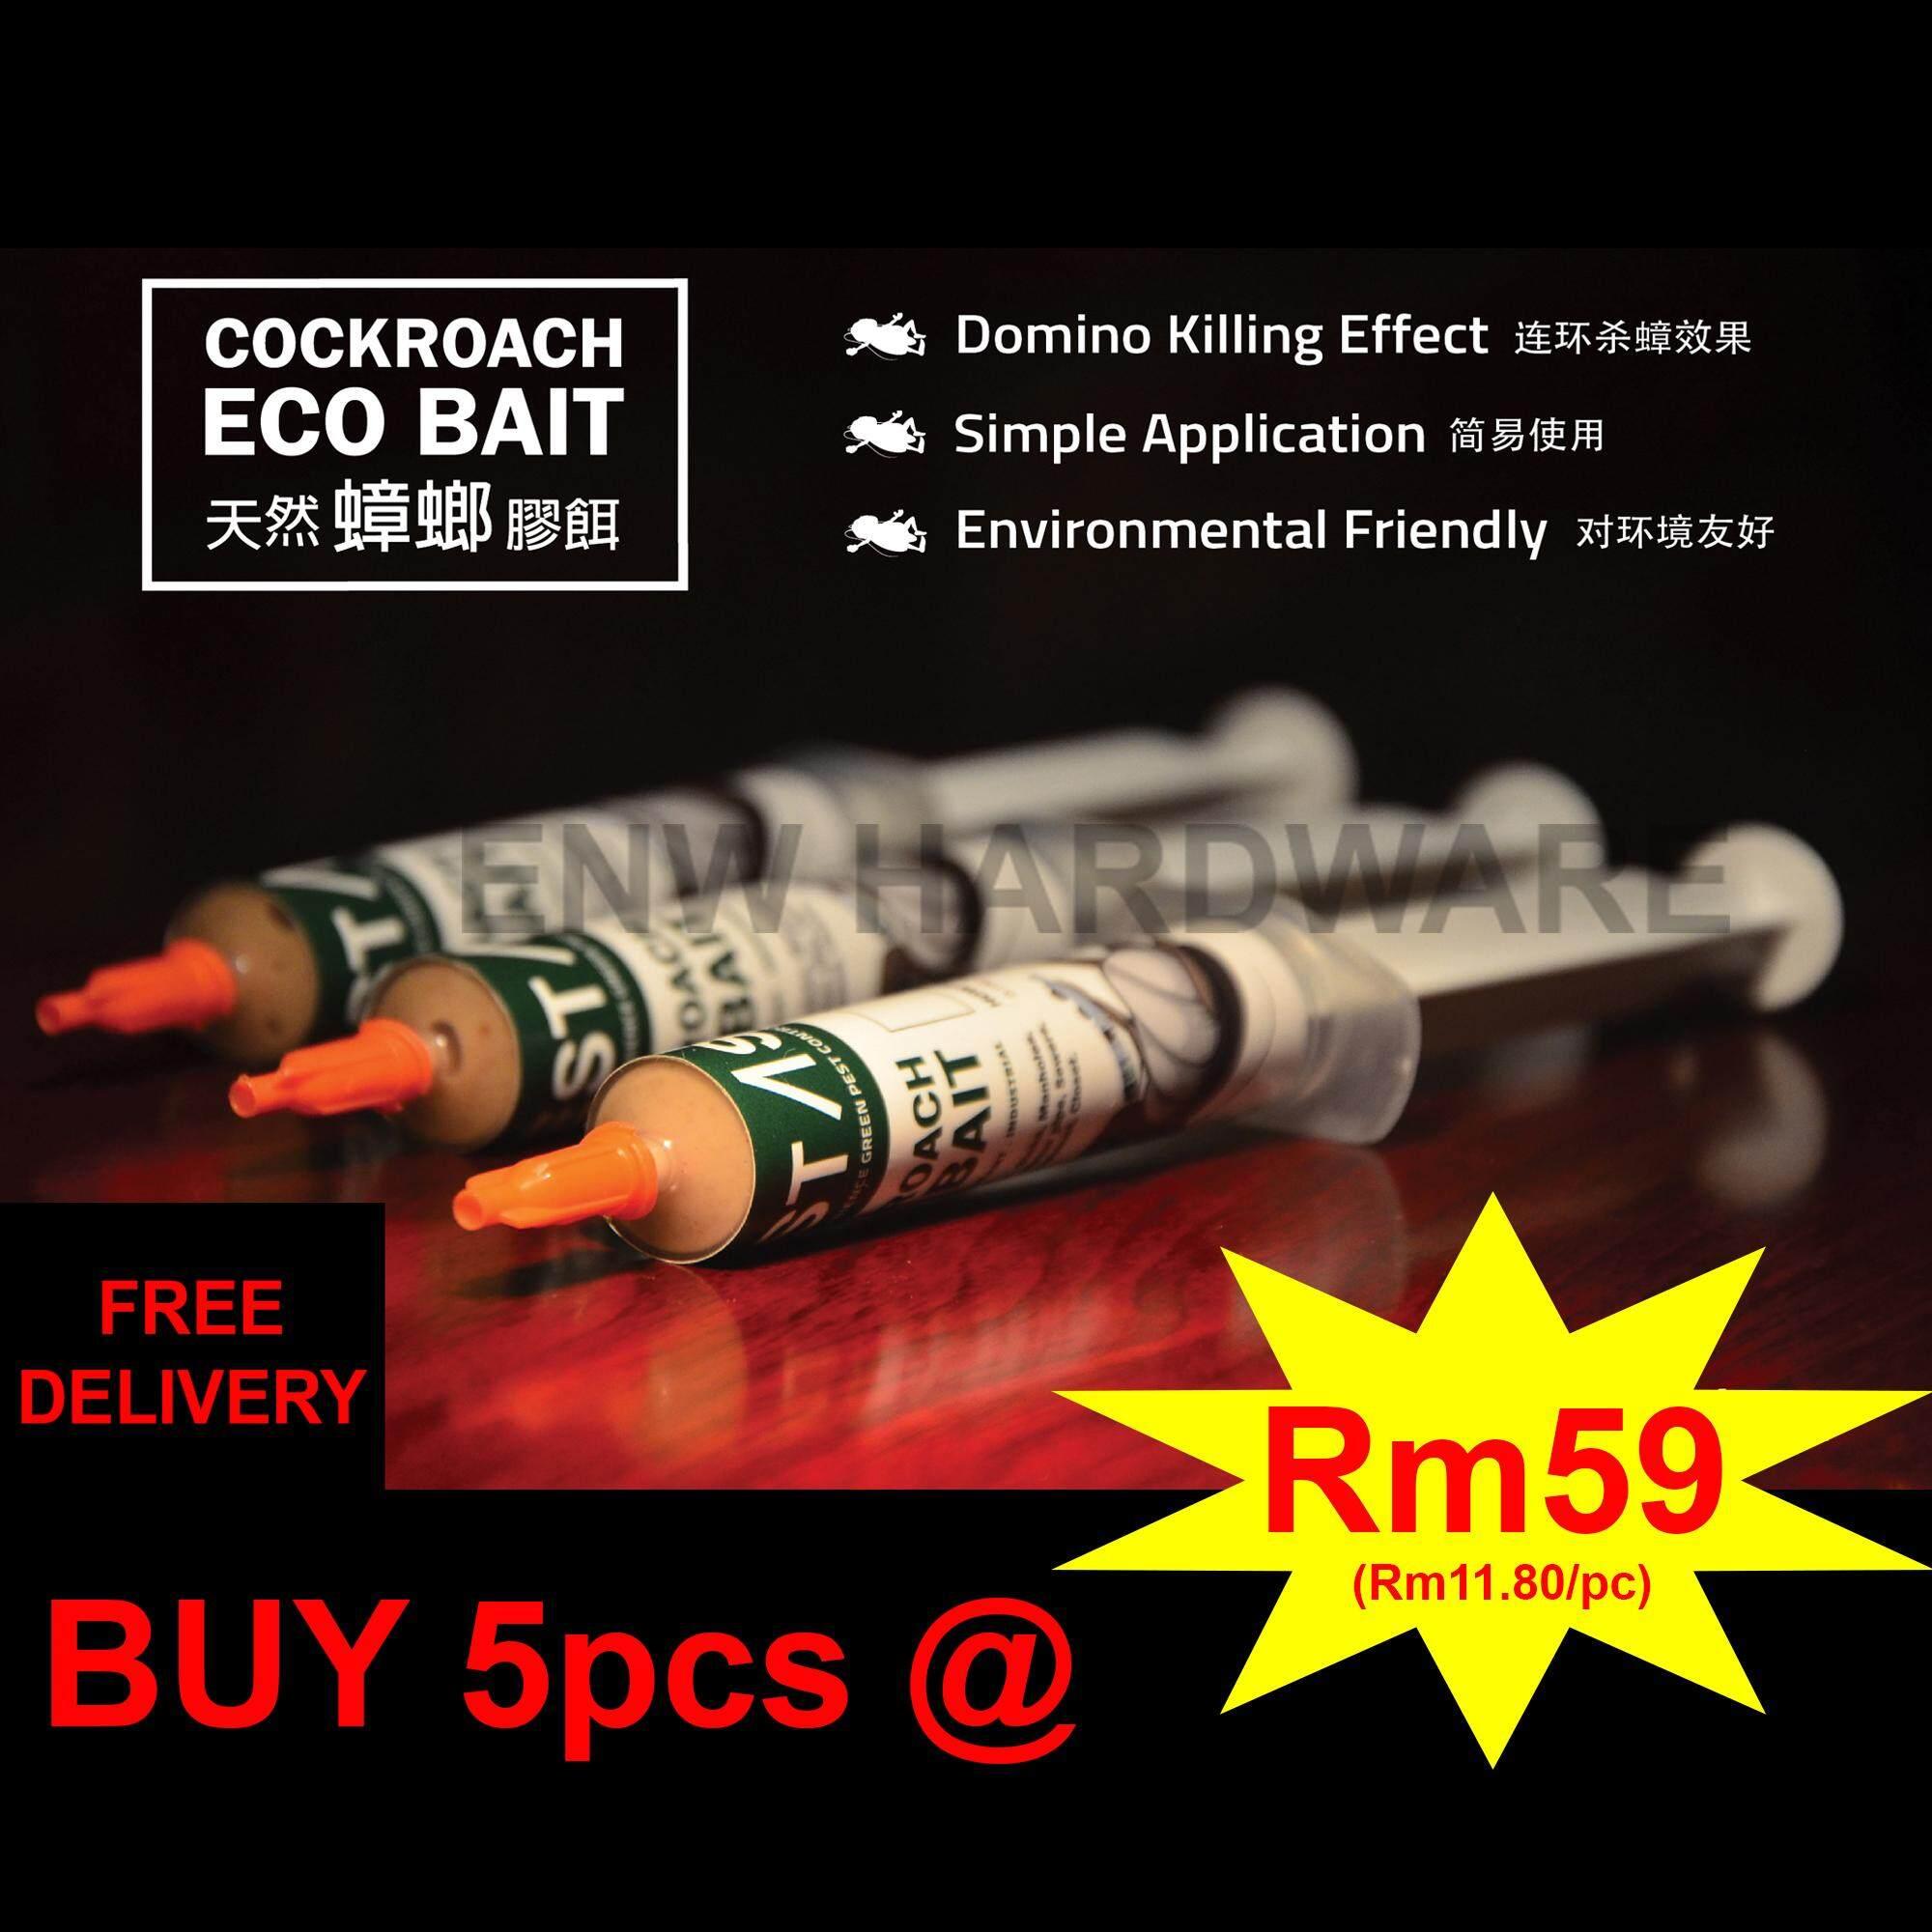 5pcs x PEST ASIA Cockroach Eco Gel Bait, 10g [Roach Killer]